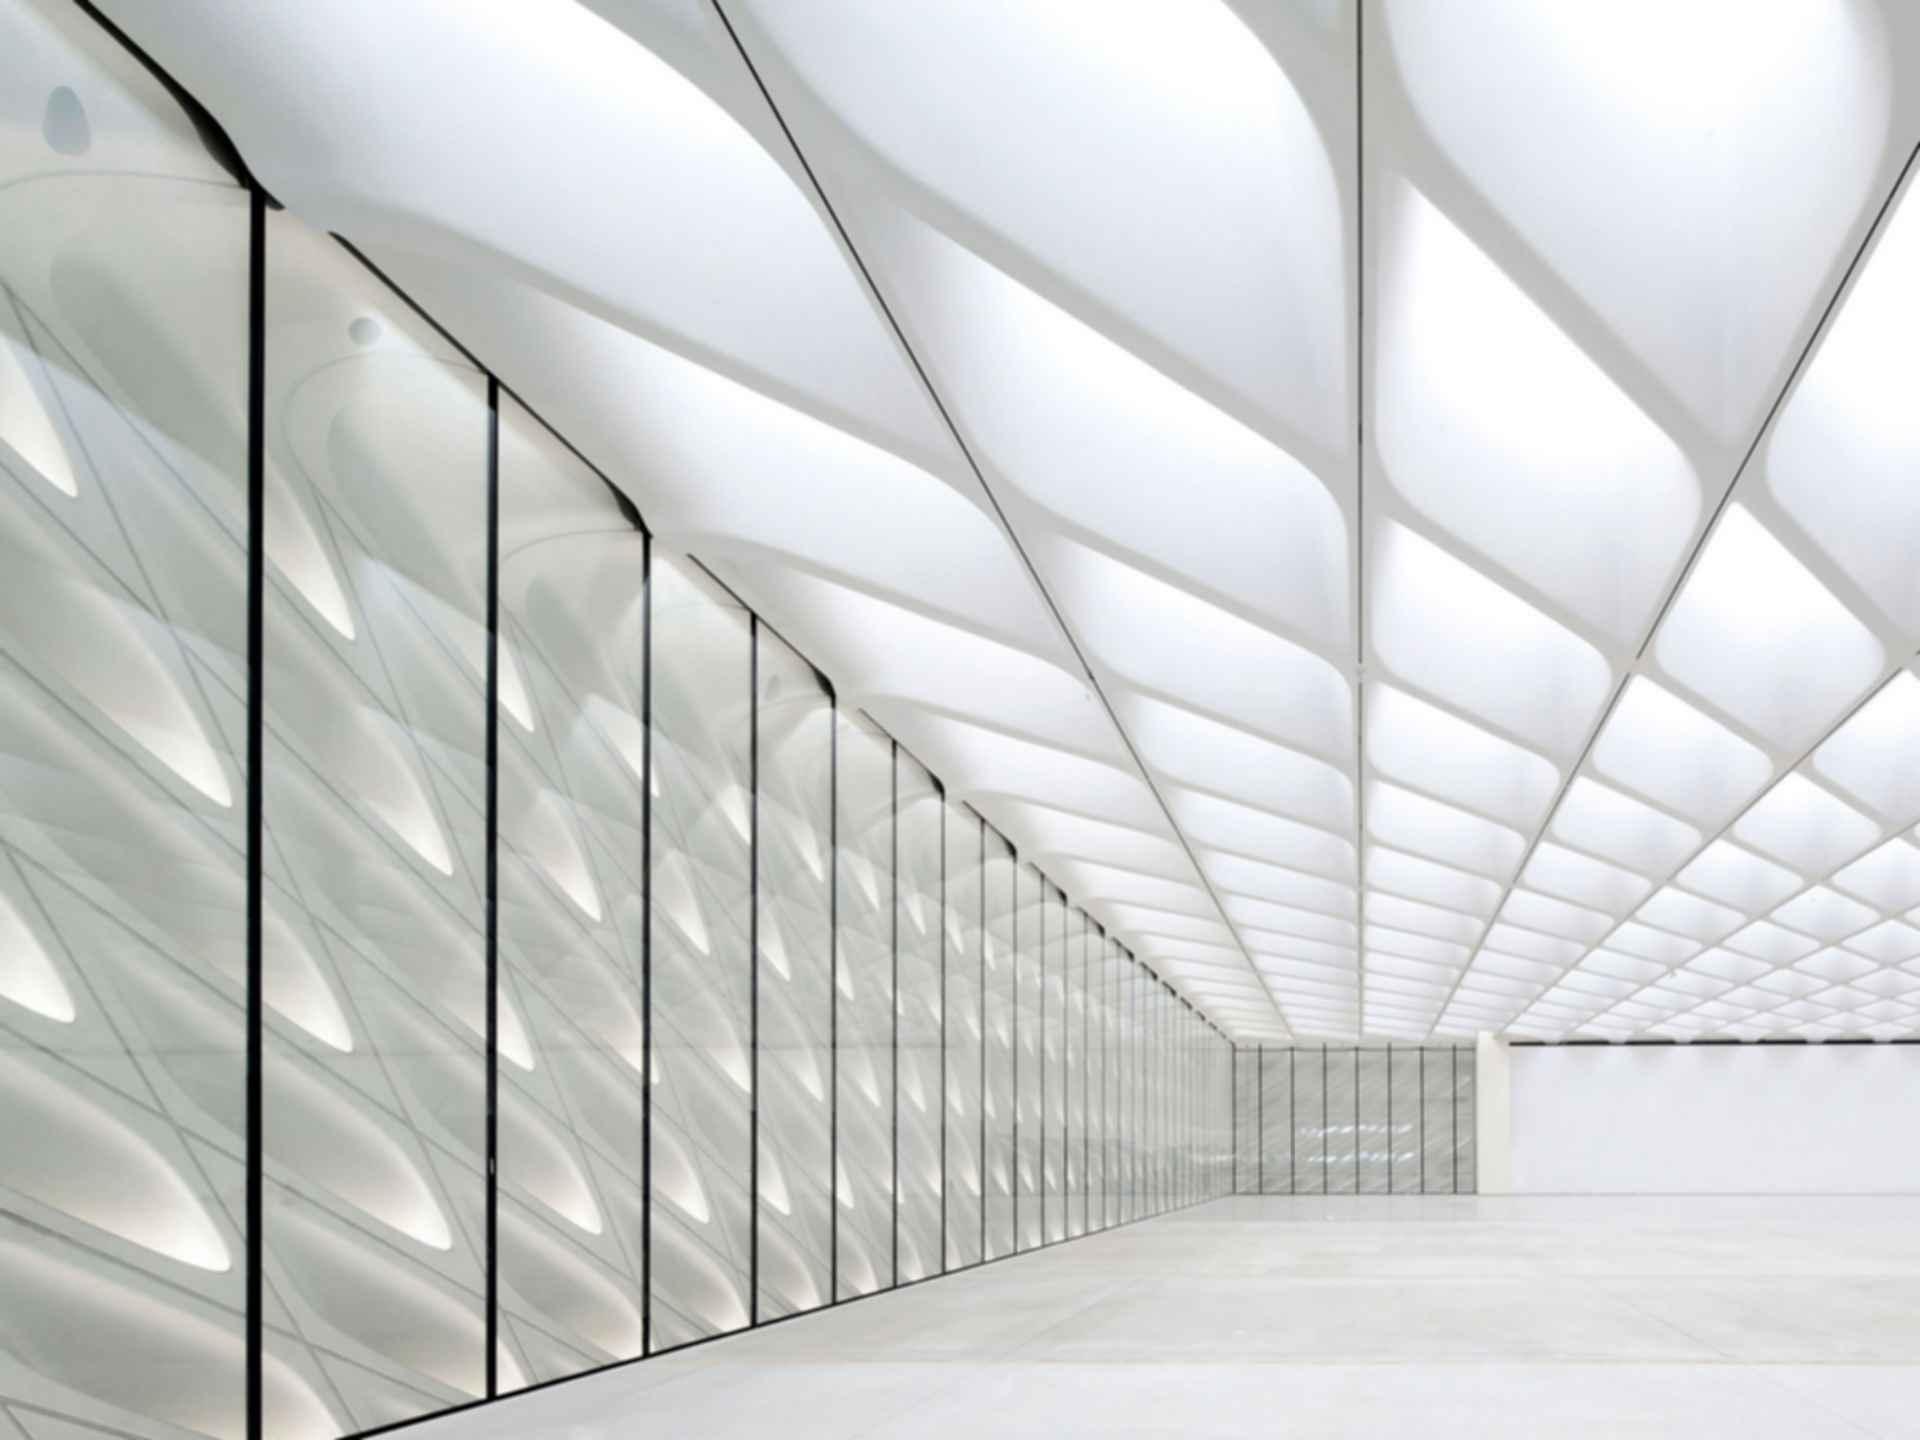 The Broad Museum - Interior/Facade